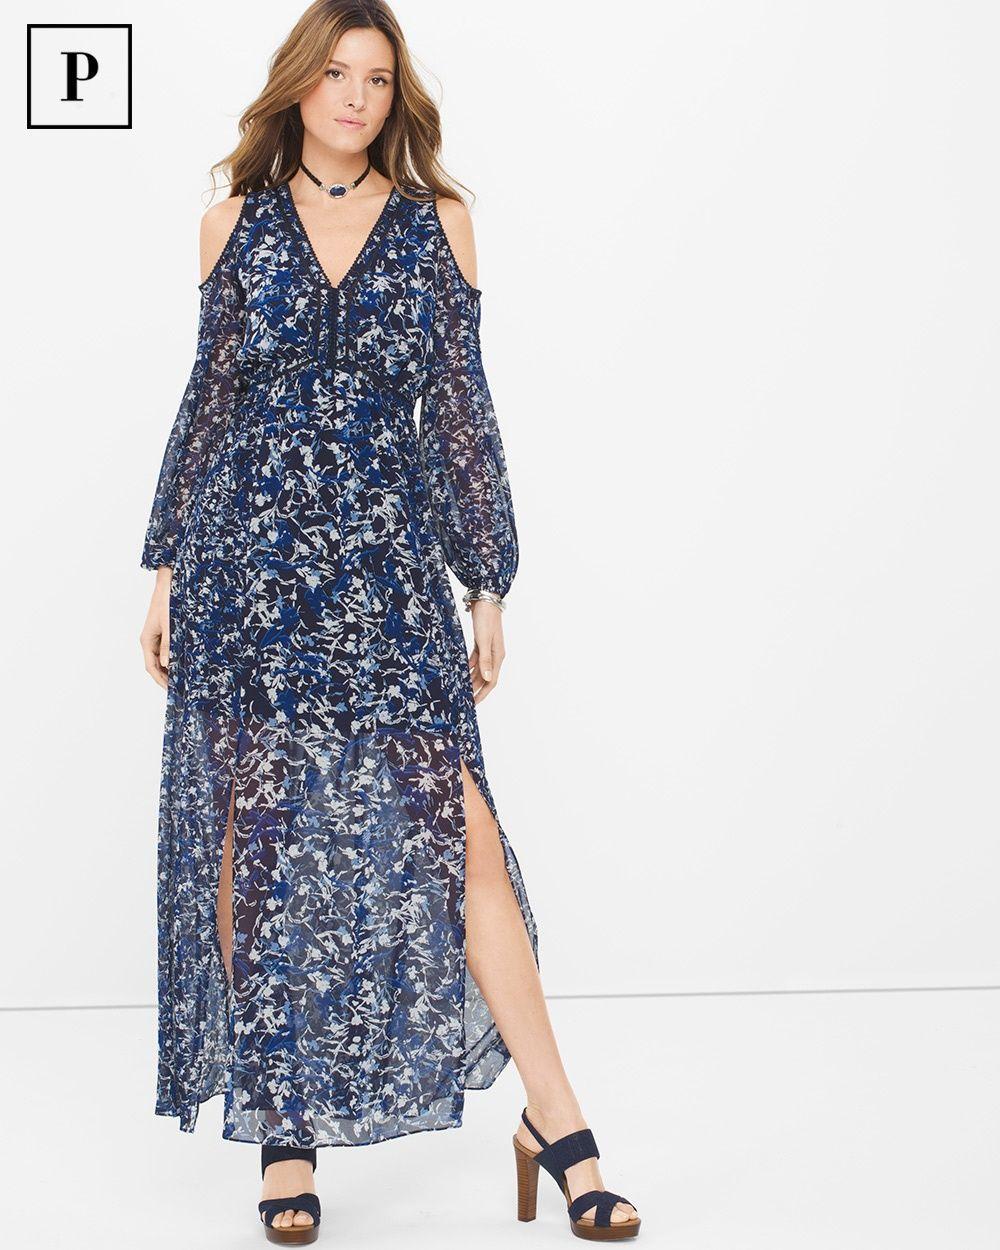 0276086f35 Petite Maxi Dresses On Amazon